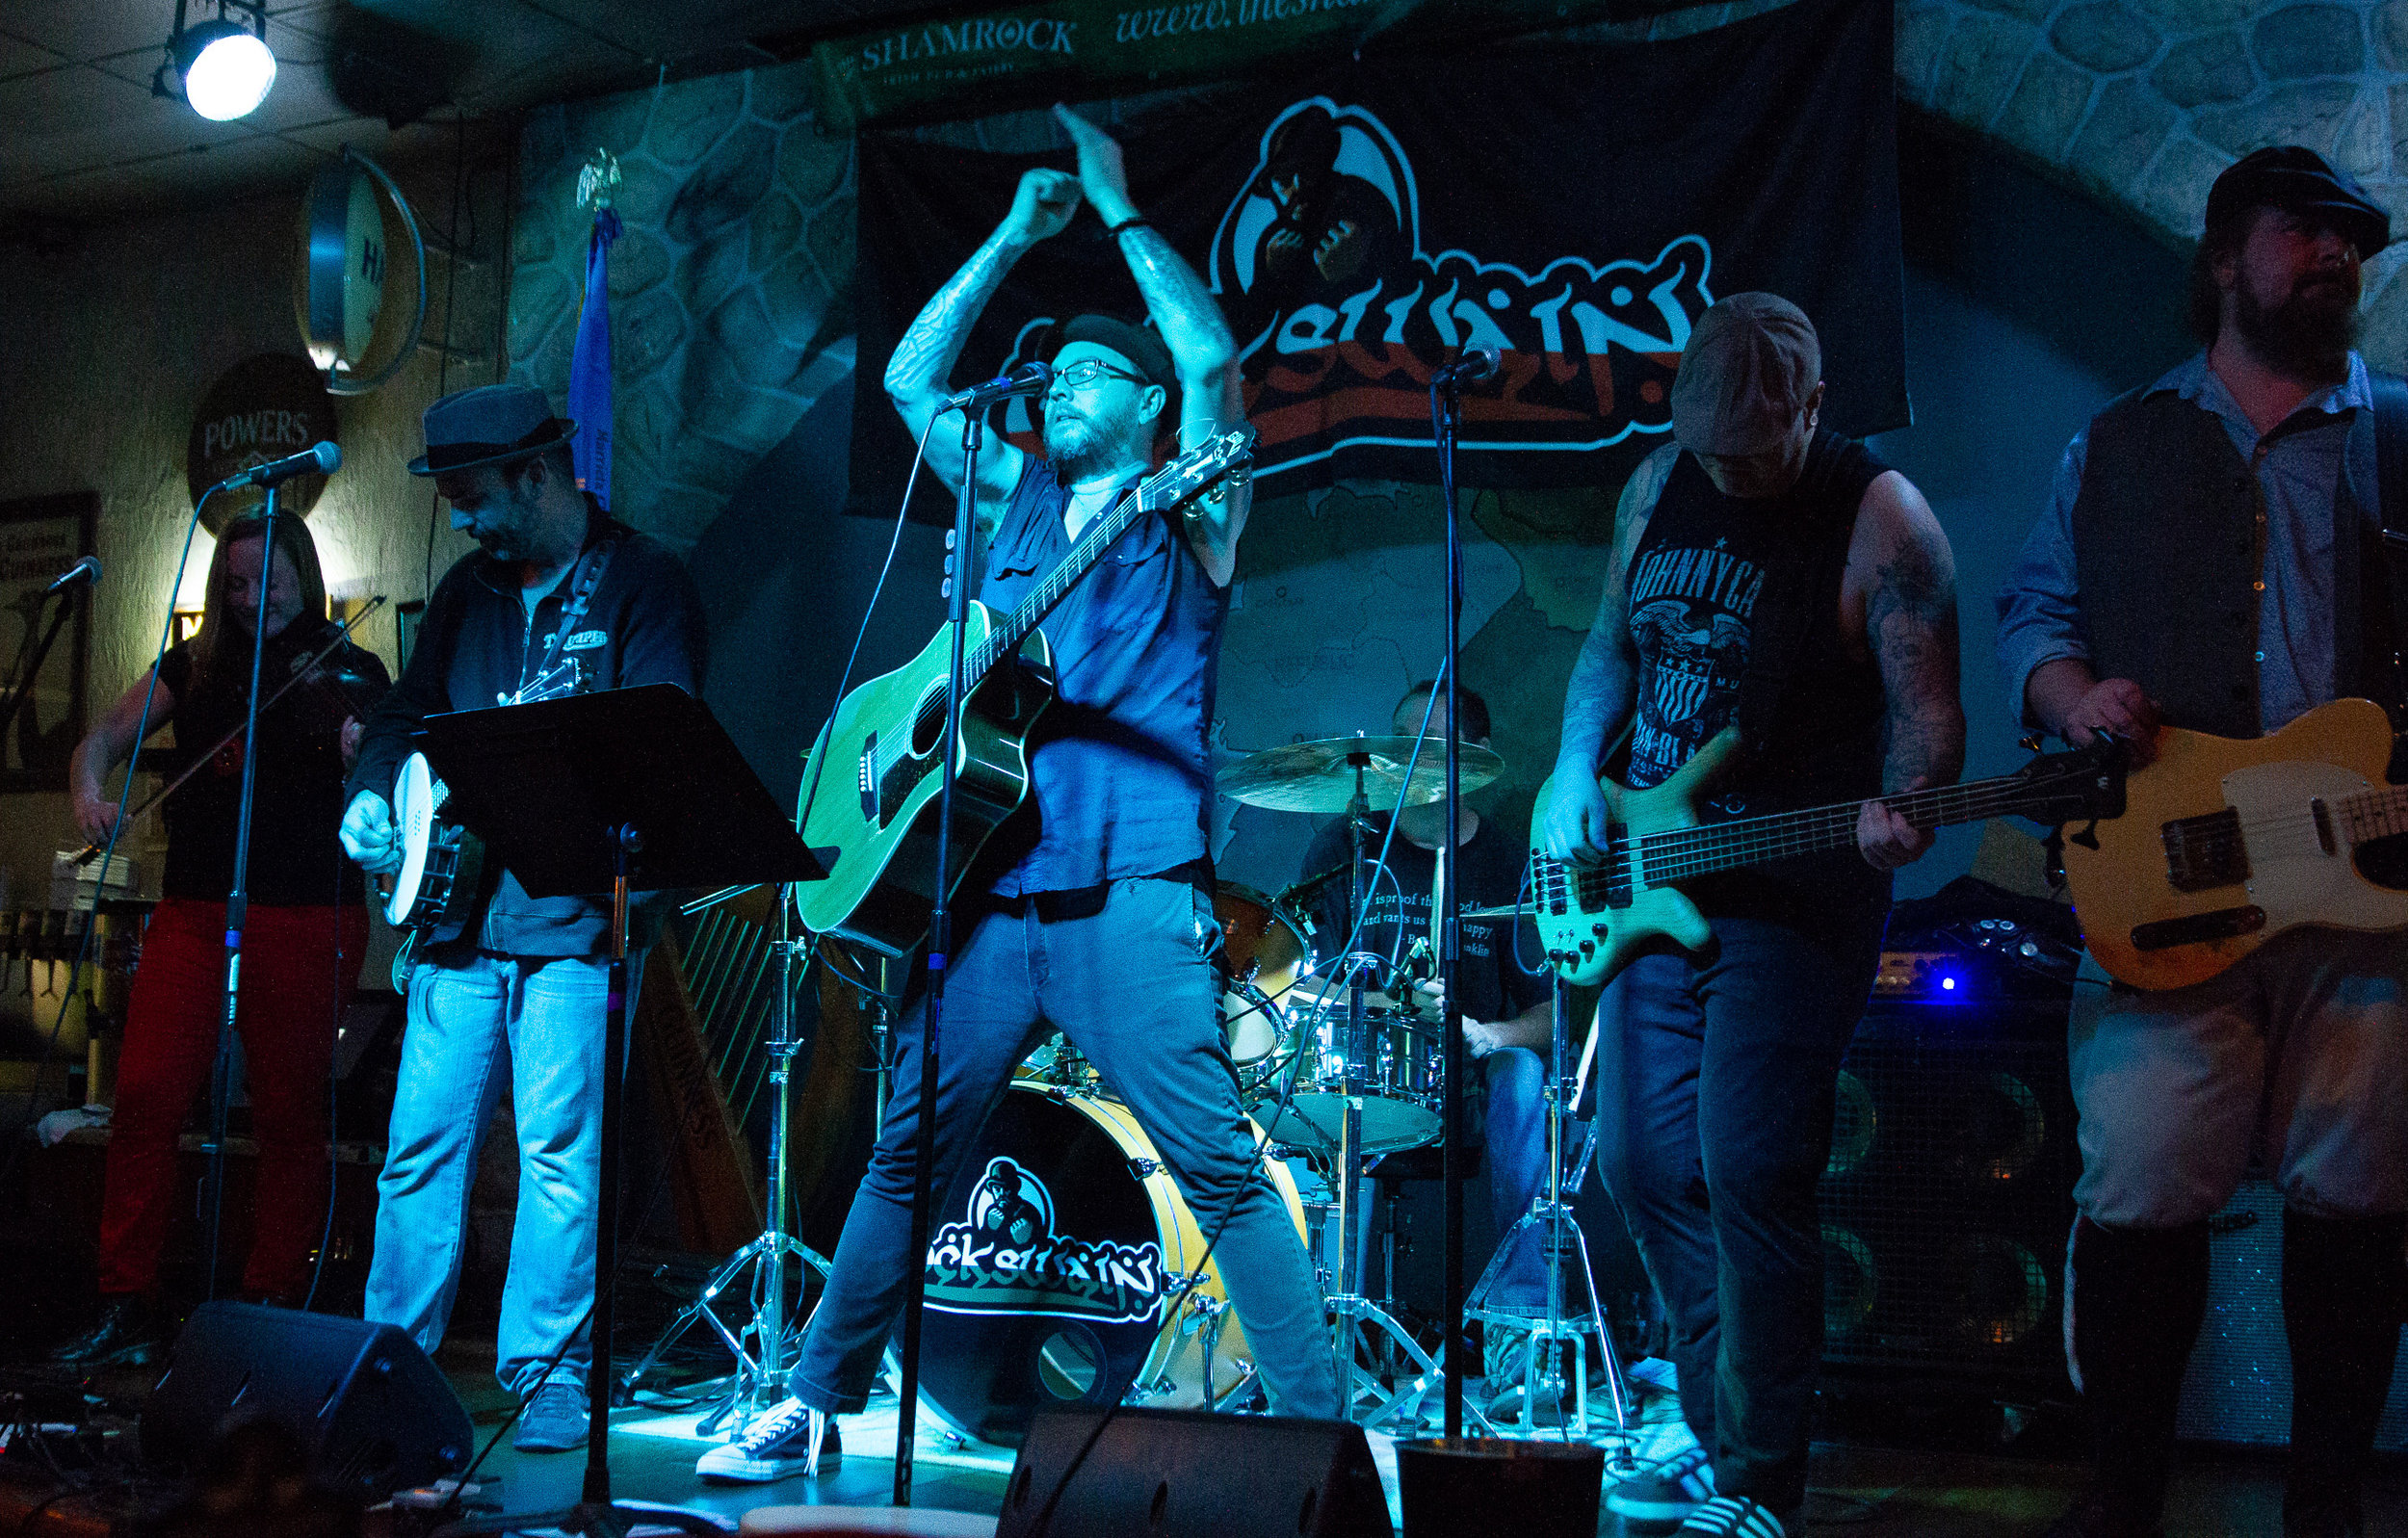 Cockswain - Official Website of Irish/Celtic Folk Punk Band